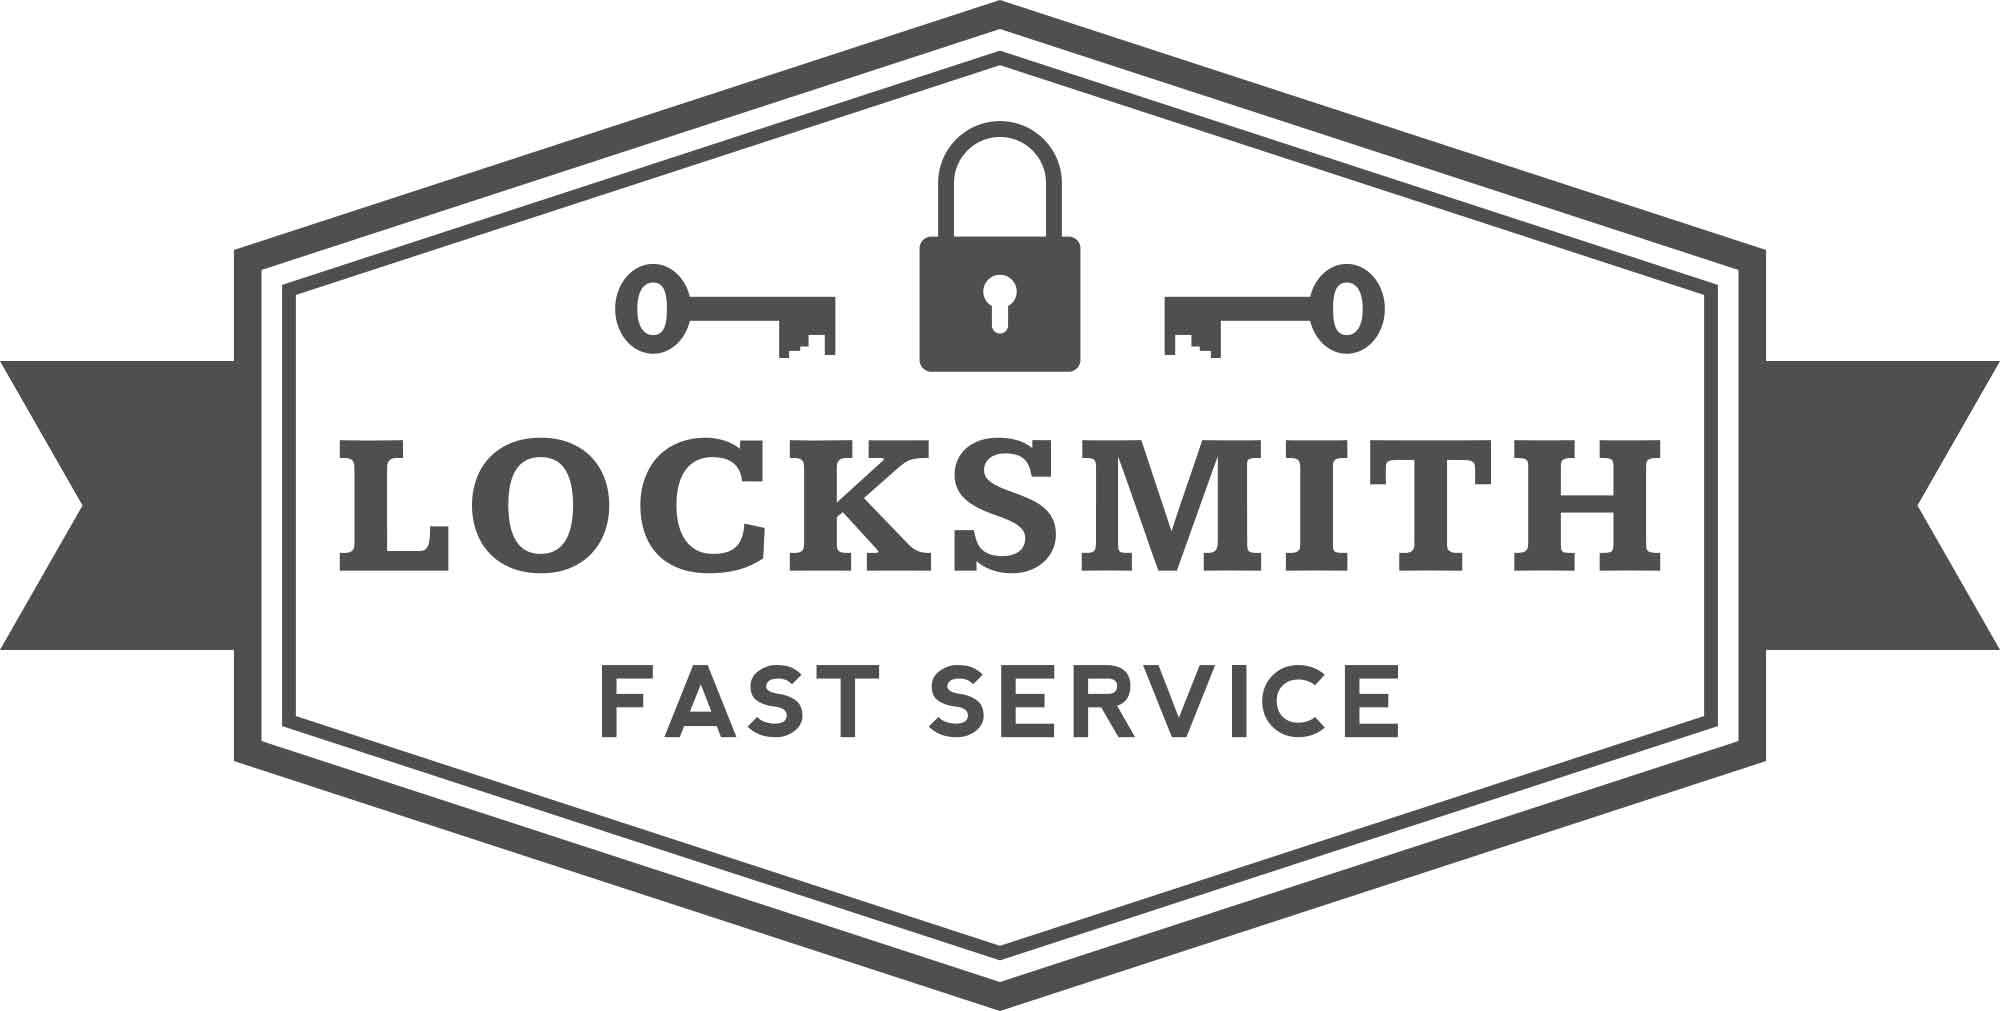 Car Key Replacement Essex Service Auto Locksmiths Essex UK